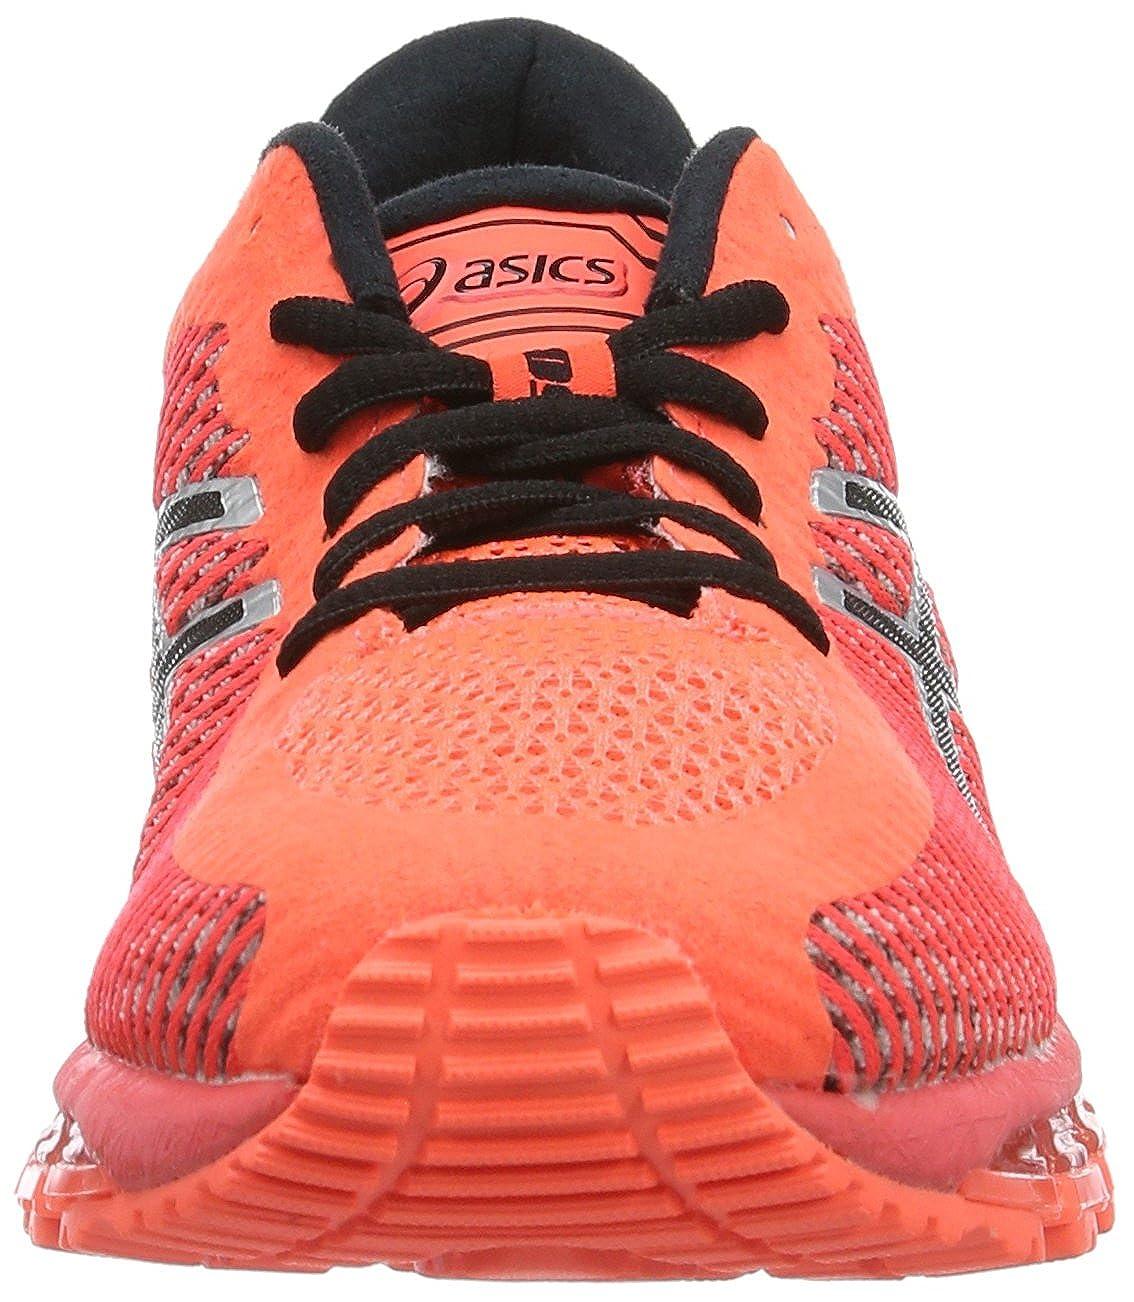 timeless design 32095 35e26 ASICS GEL-QUANTUM 360 CM Women s Running Shoes (T6G6N)  Amazon.co.uk  Shoes    Bags